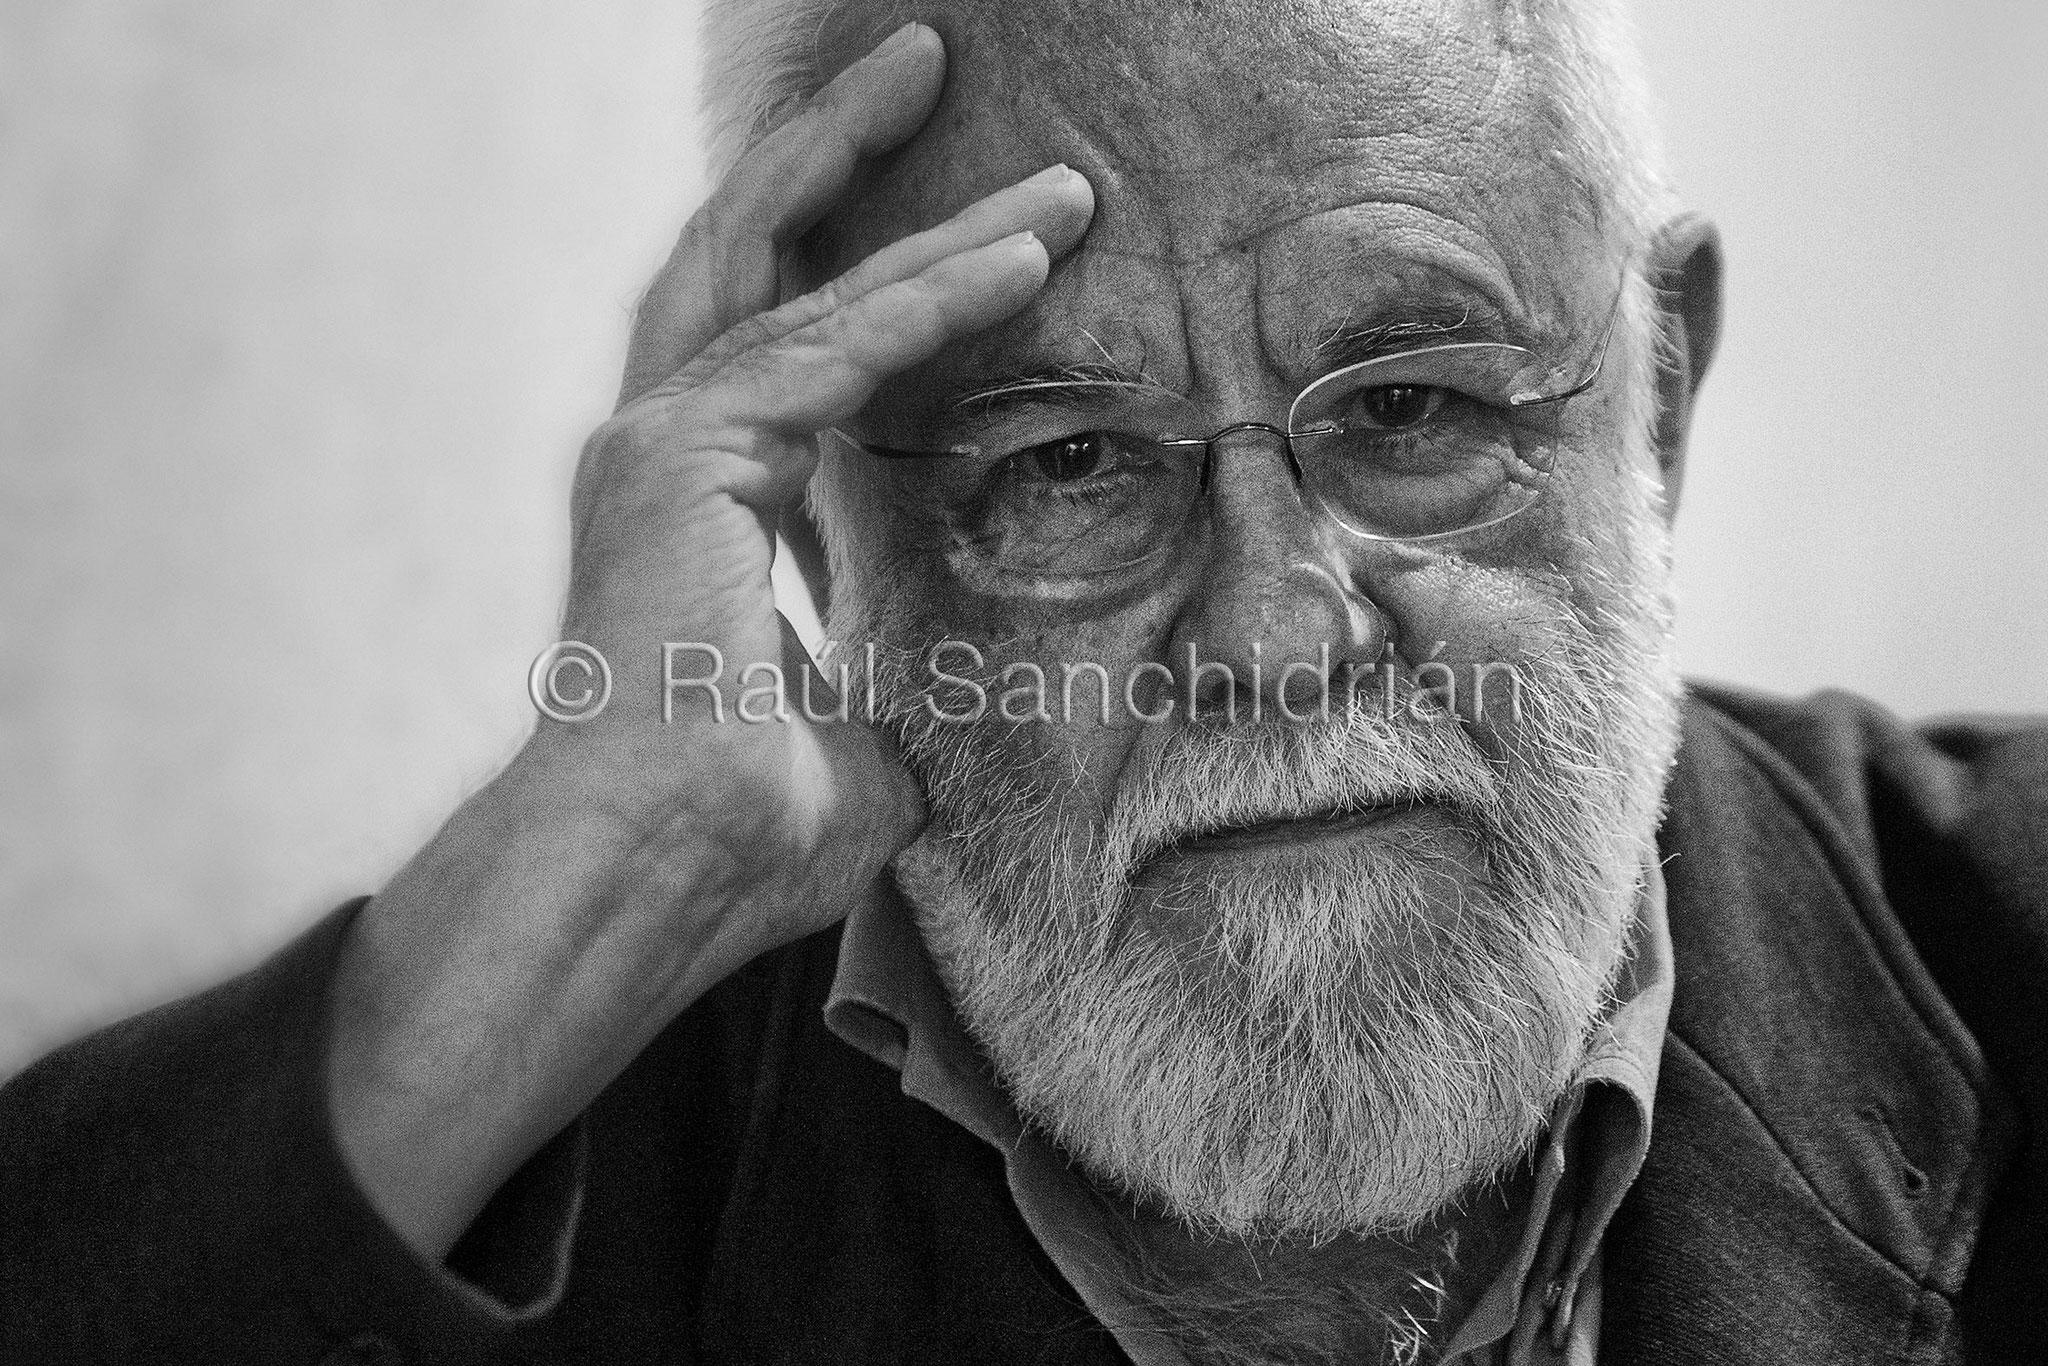 Gonzalo Suárez / © Raúl Sanchidrián